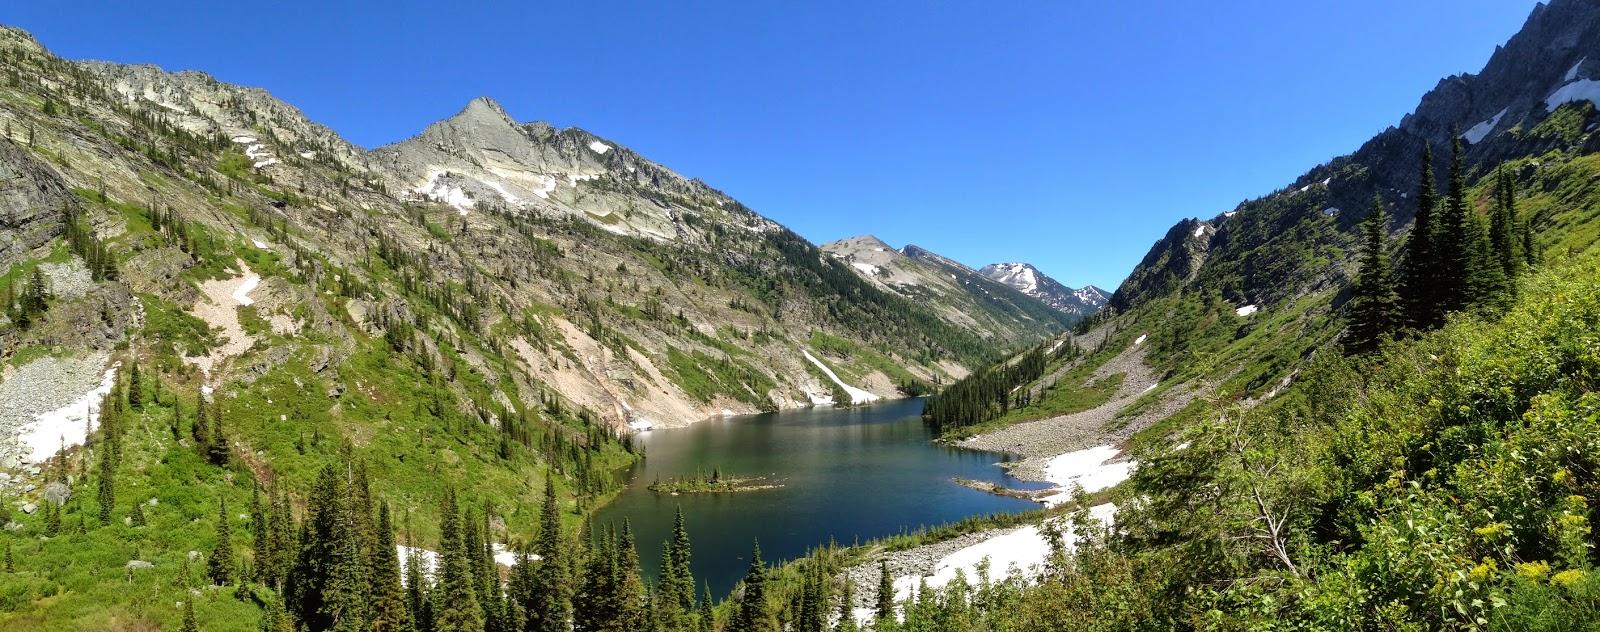 Amazing Rock Lake, Cabinet Mountains, Montana